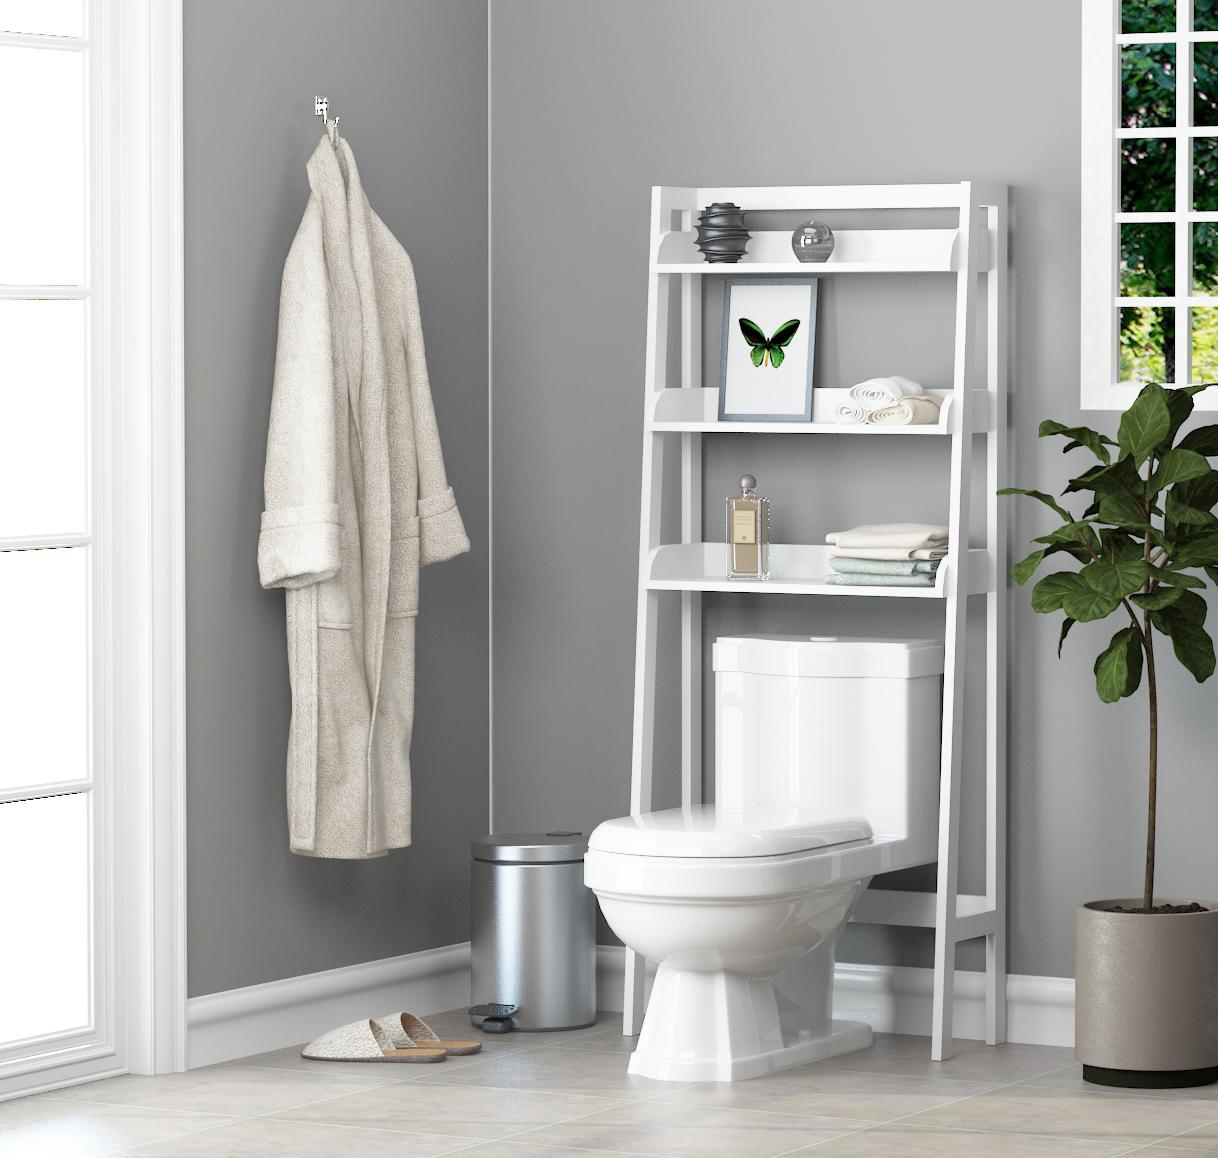 Utex 3 Shelf Bathroom Organizer Over, Bathroom Space Saver Over Toilet